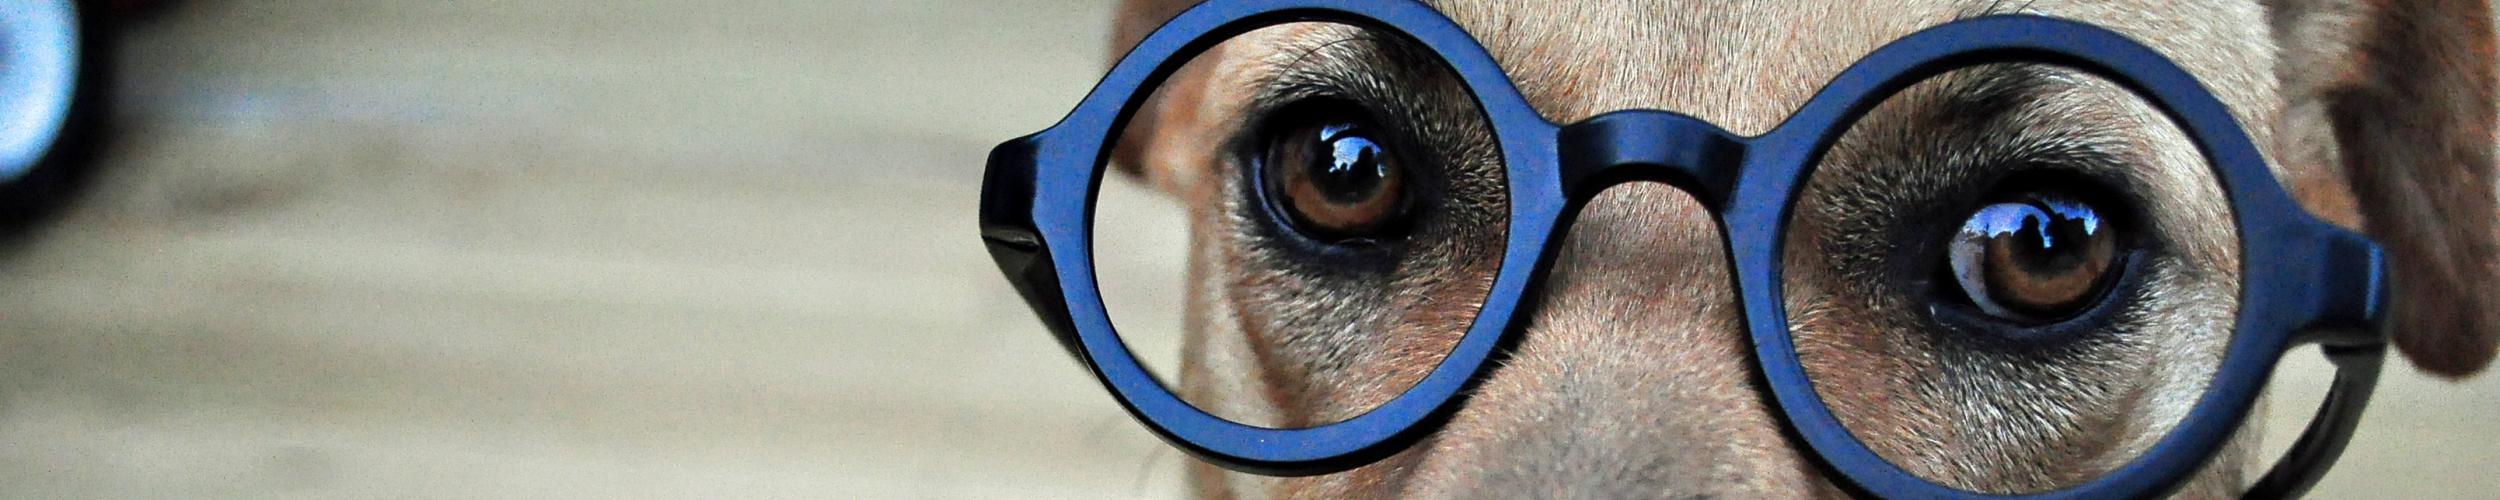 Andere brillen